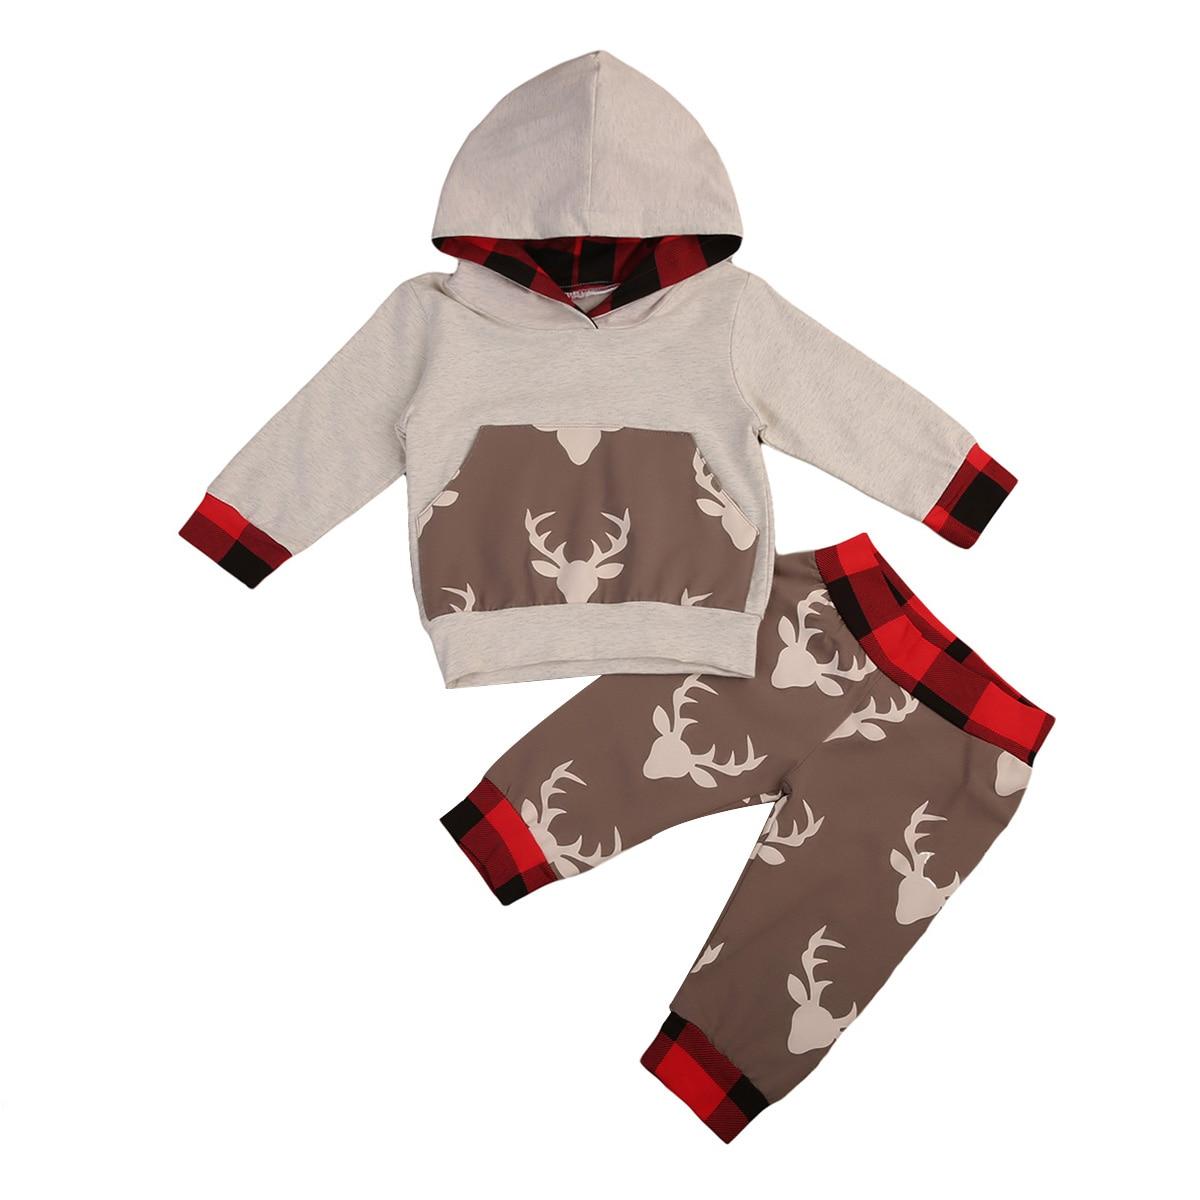 Plaid deer print baby hoodie autumn clothes set Newborn Baby 2pcs deer Pattern Clothes Boys Girls Hoodie Tops+Pants Set 0-24M